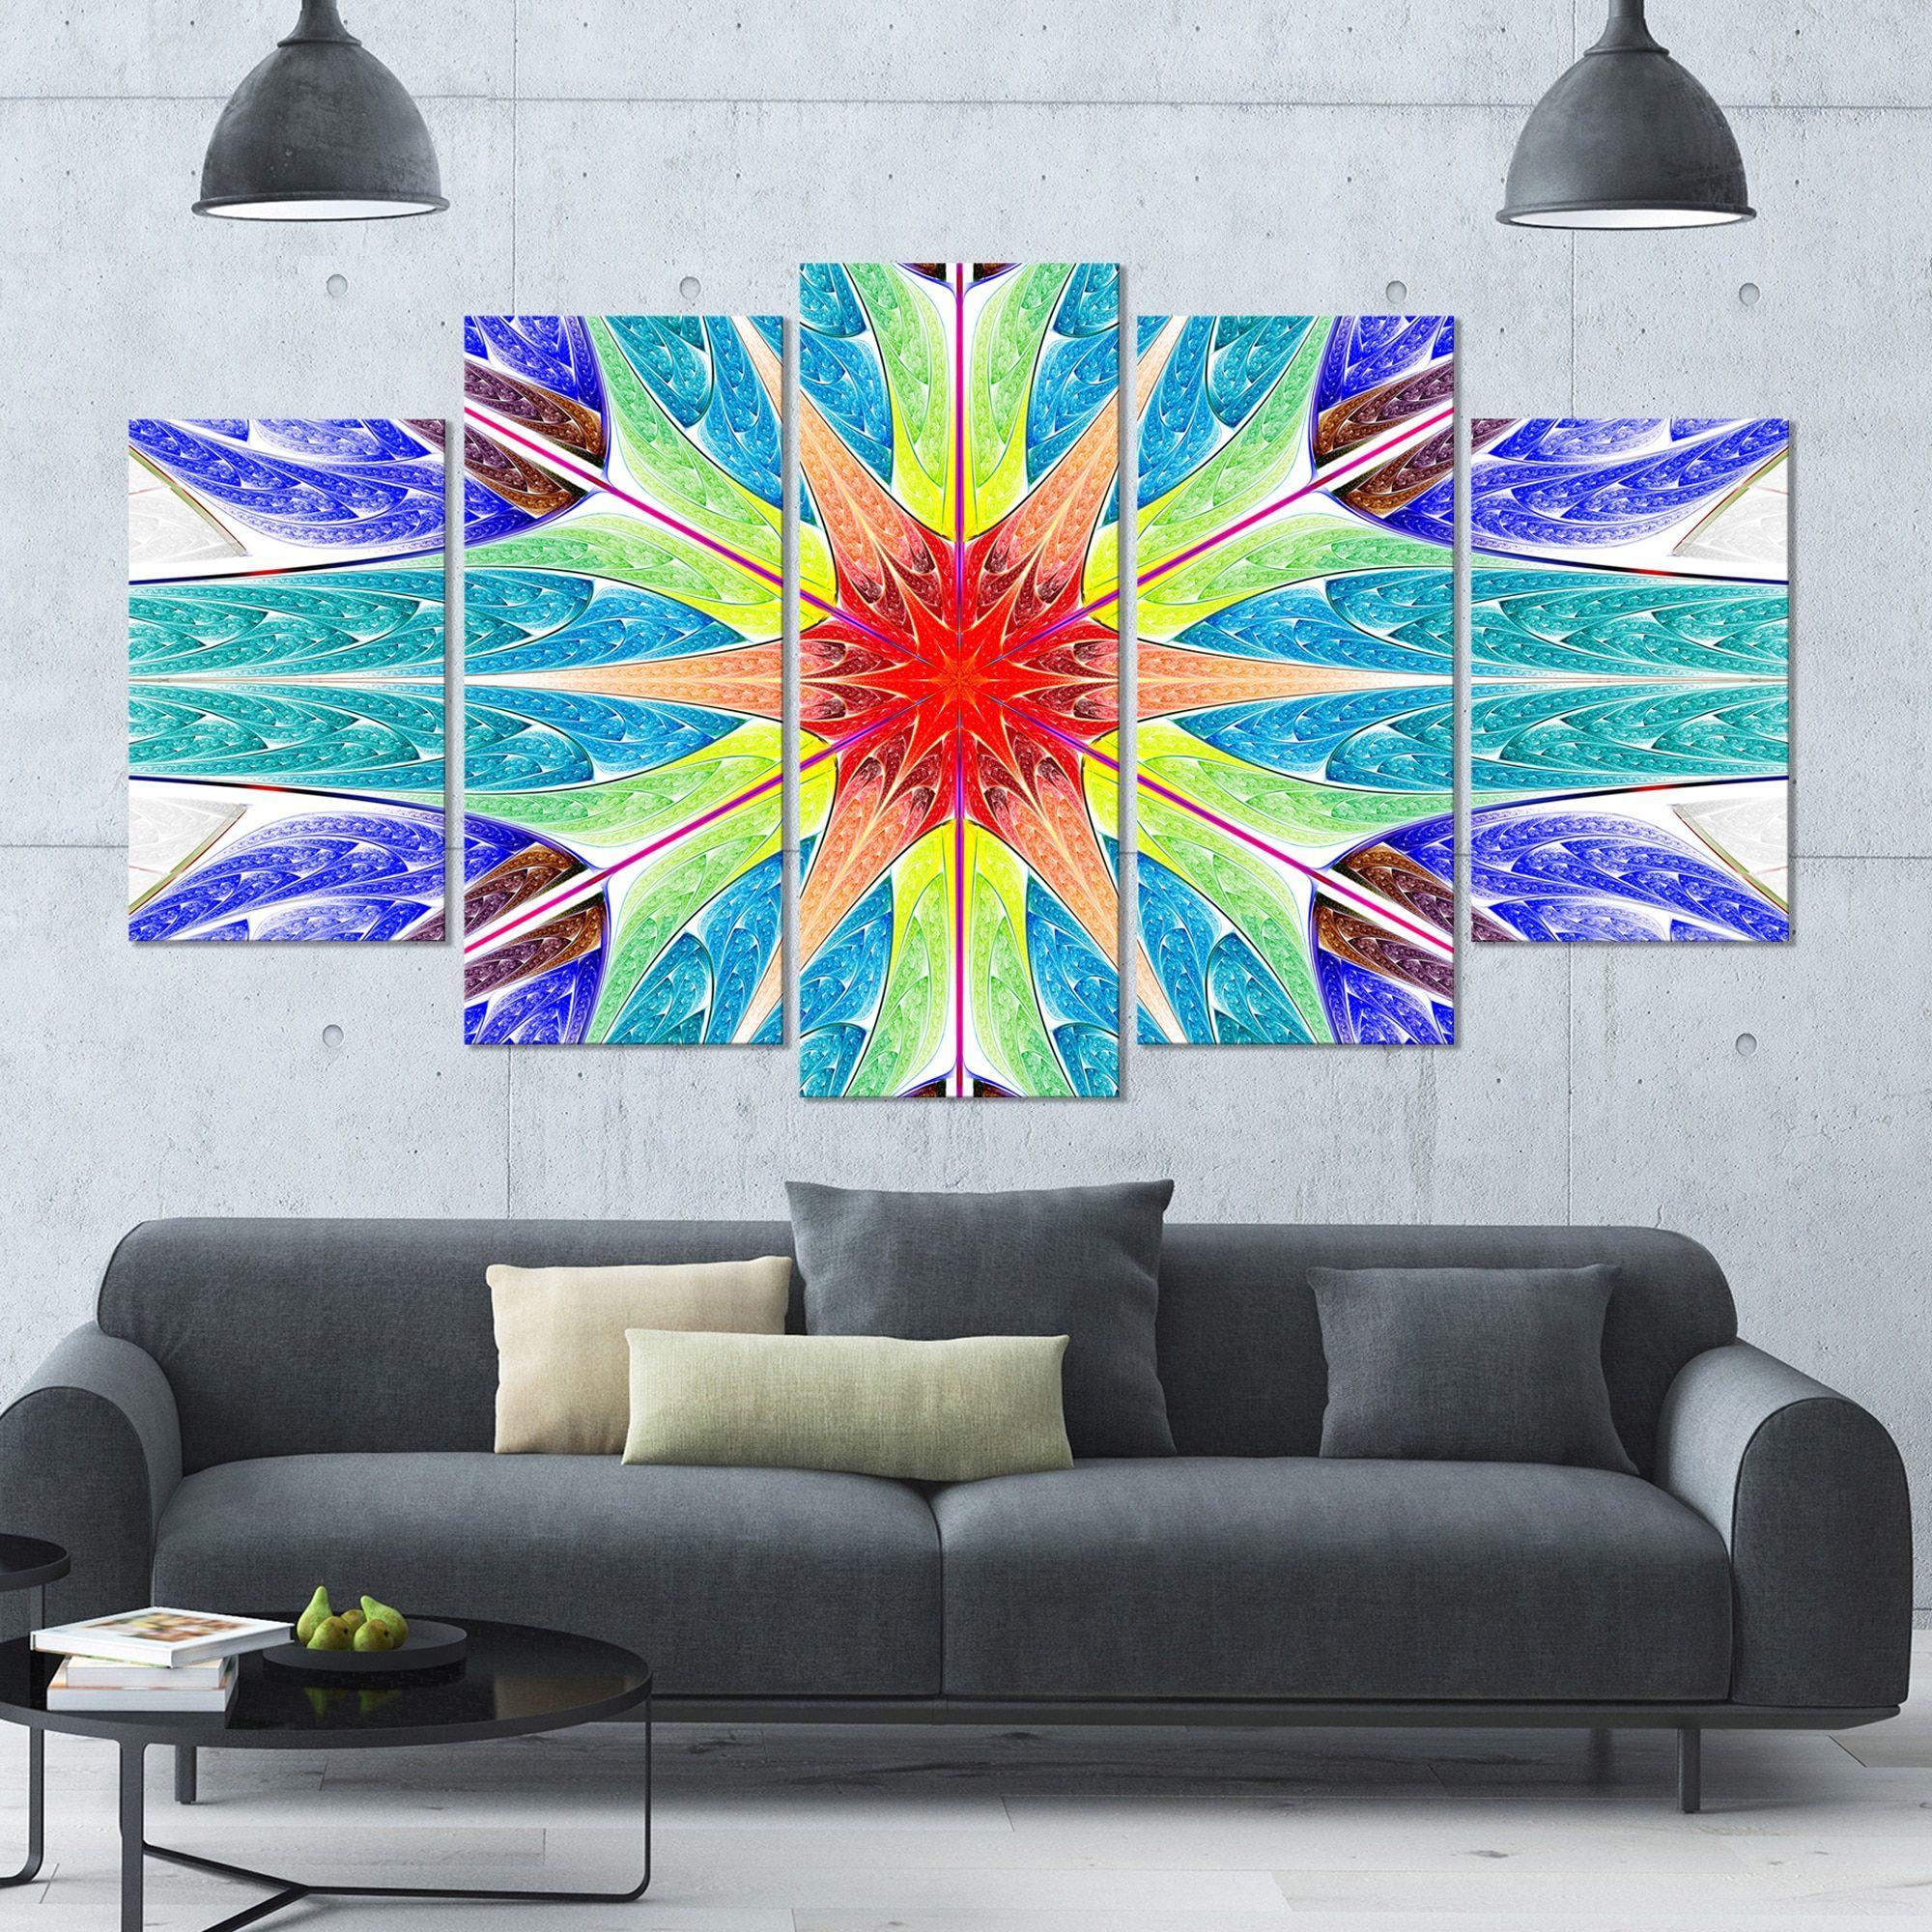 Designart 'Extraordinary Fractal Design' Glossy Canvas Art Print - 60x32 5 Panels